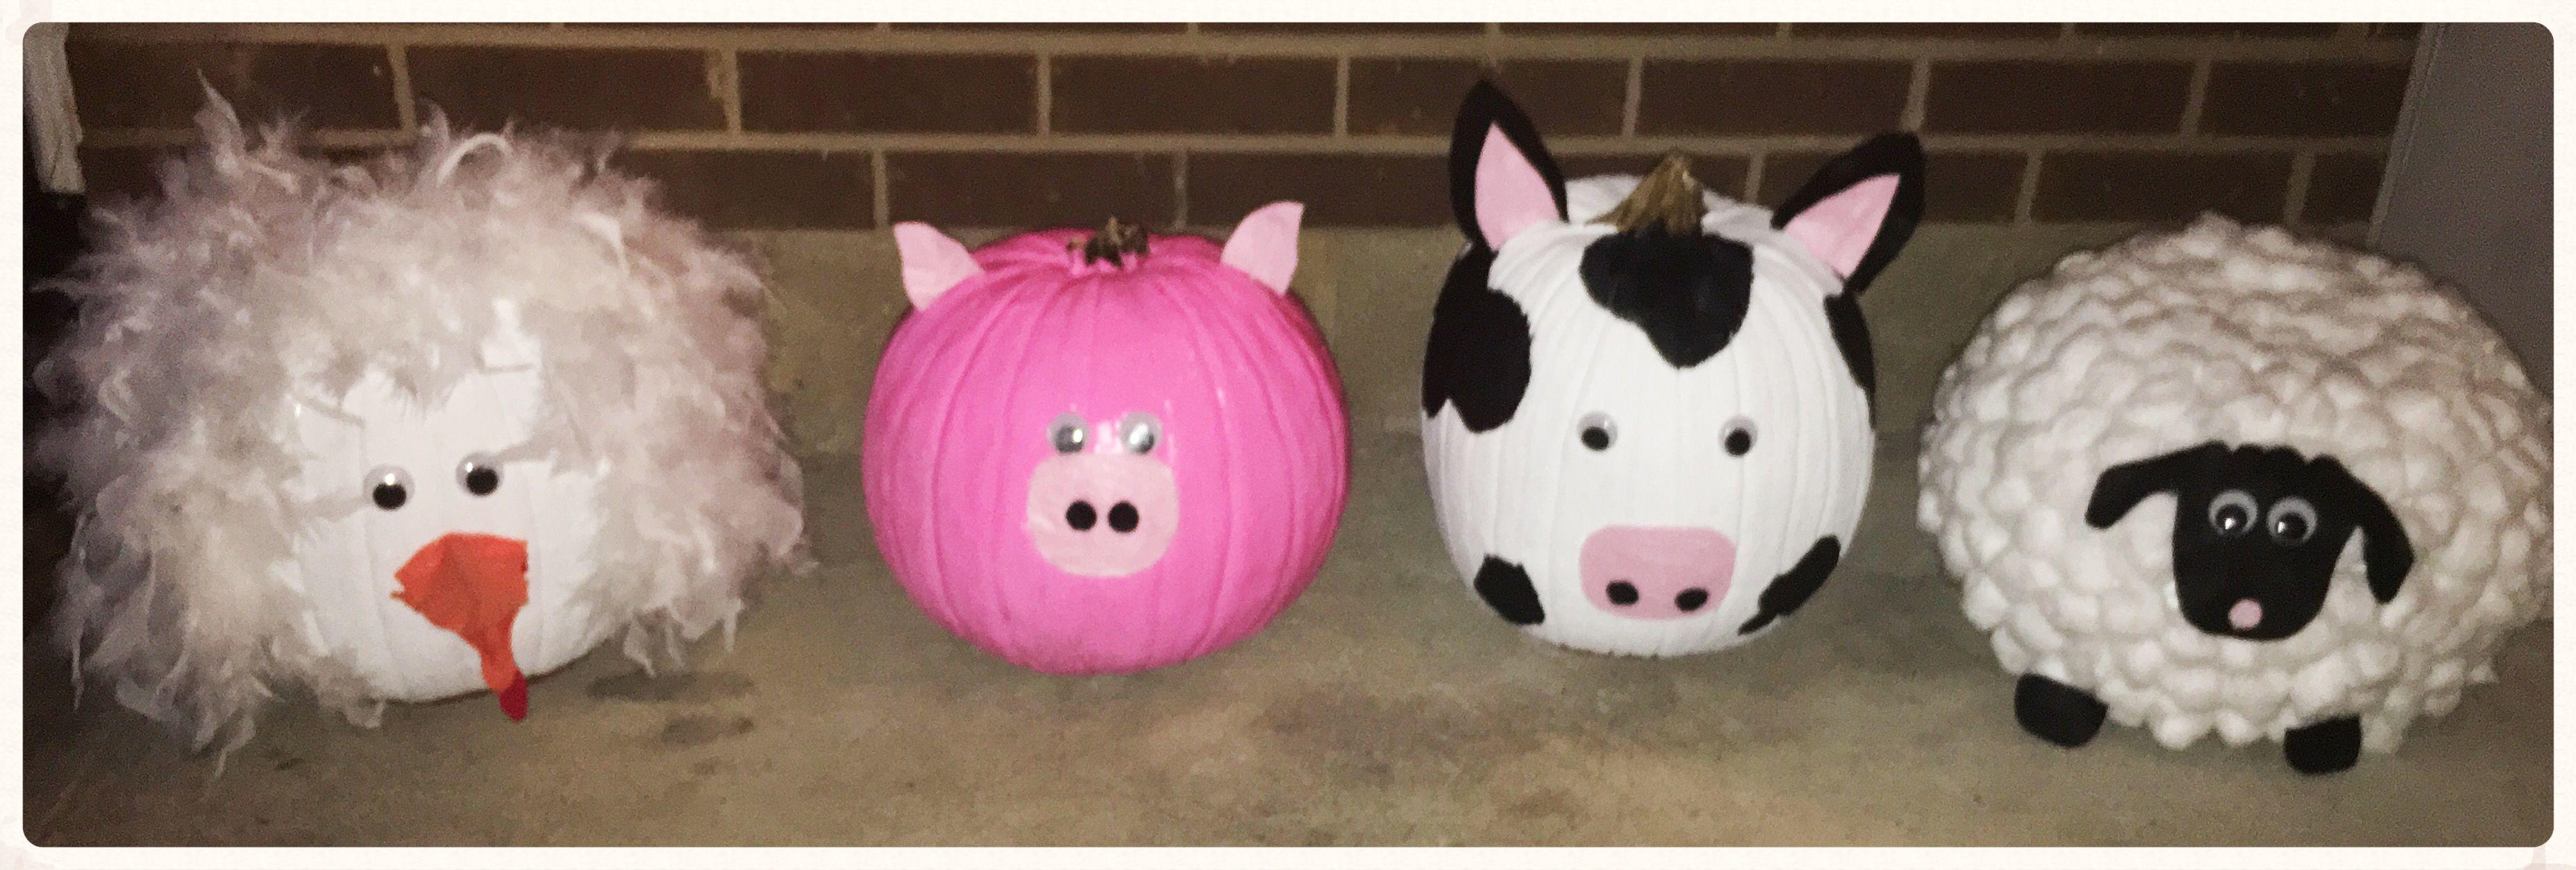 Farm animal pumpkins ! Pumpkin halloween decorations